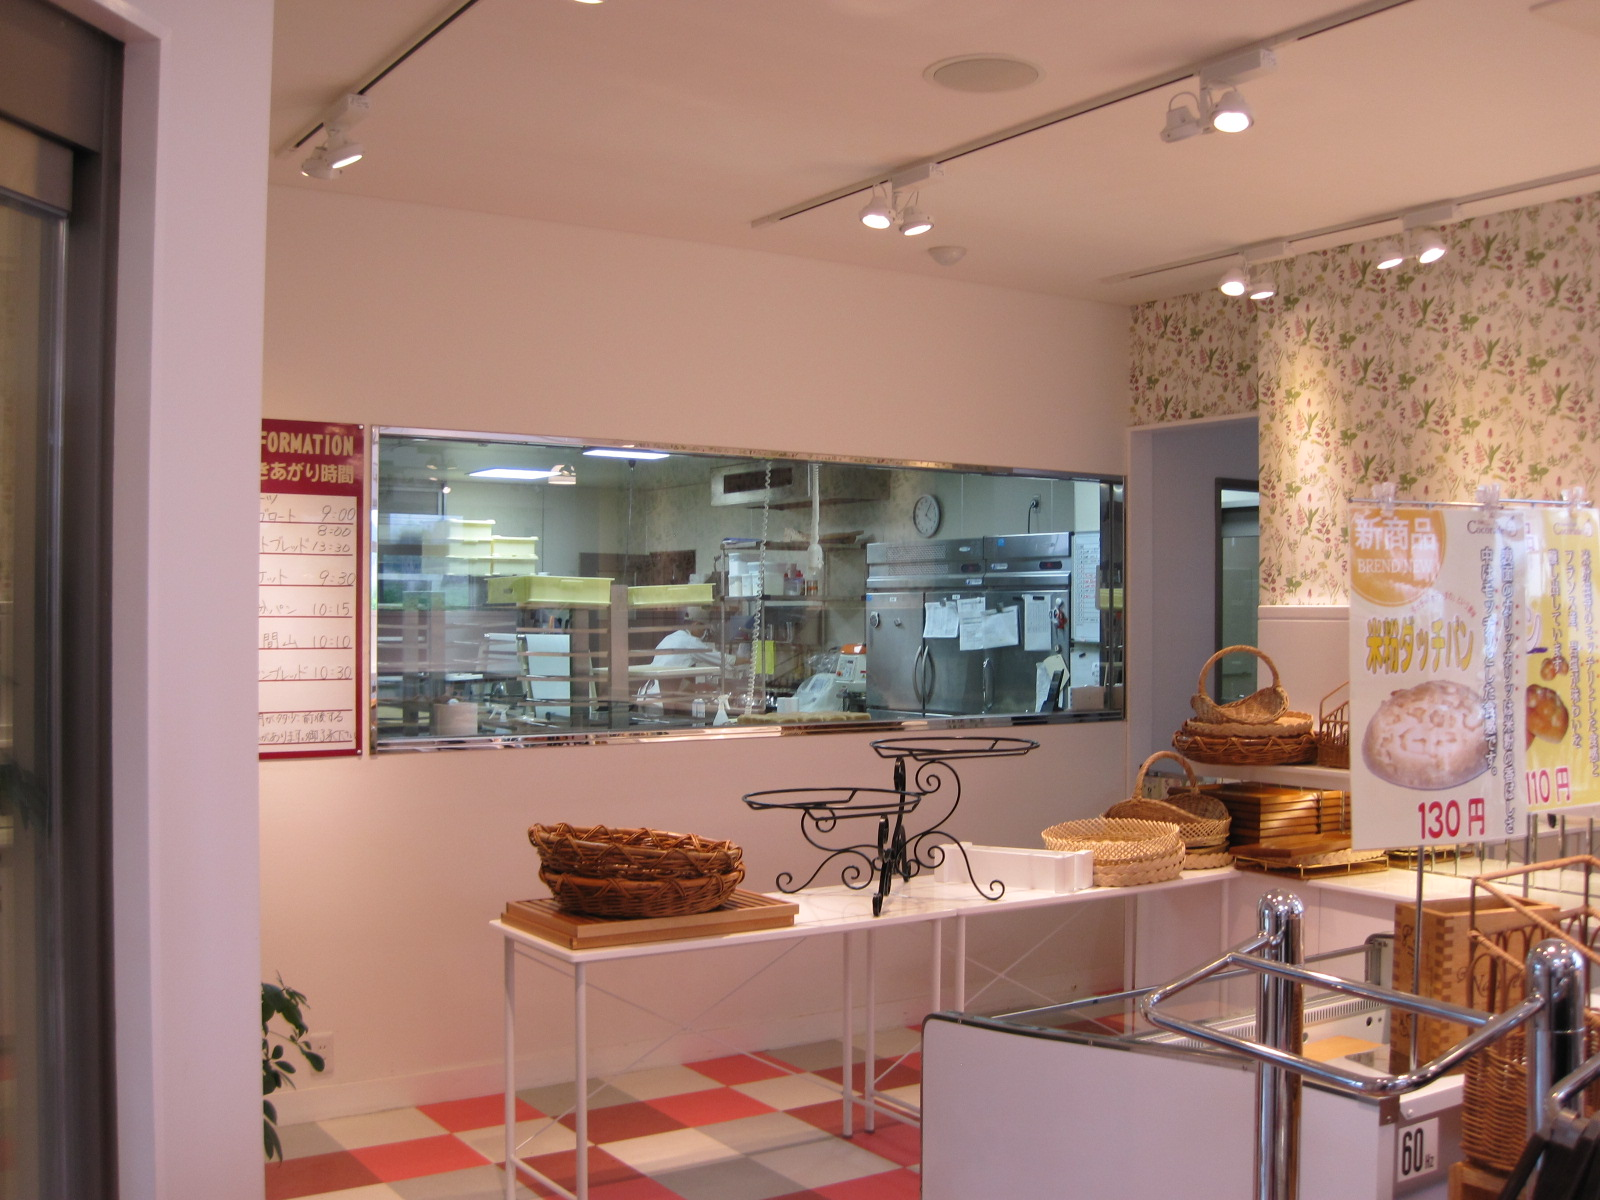 Bakery Cafe Cocorade_f0236260_1828610.jpg